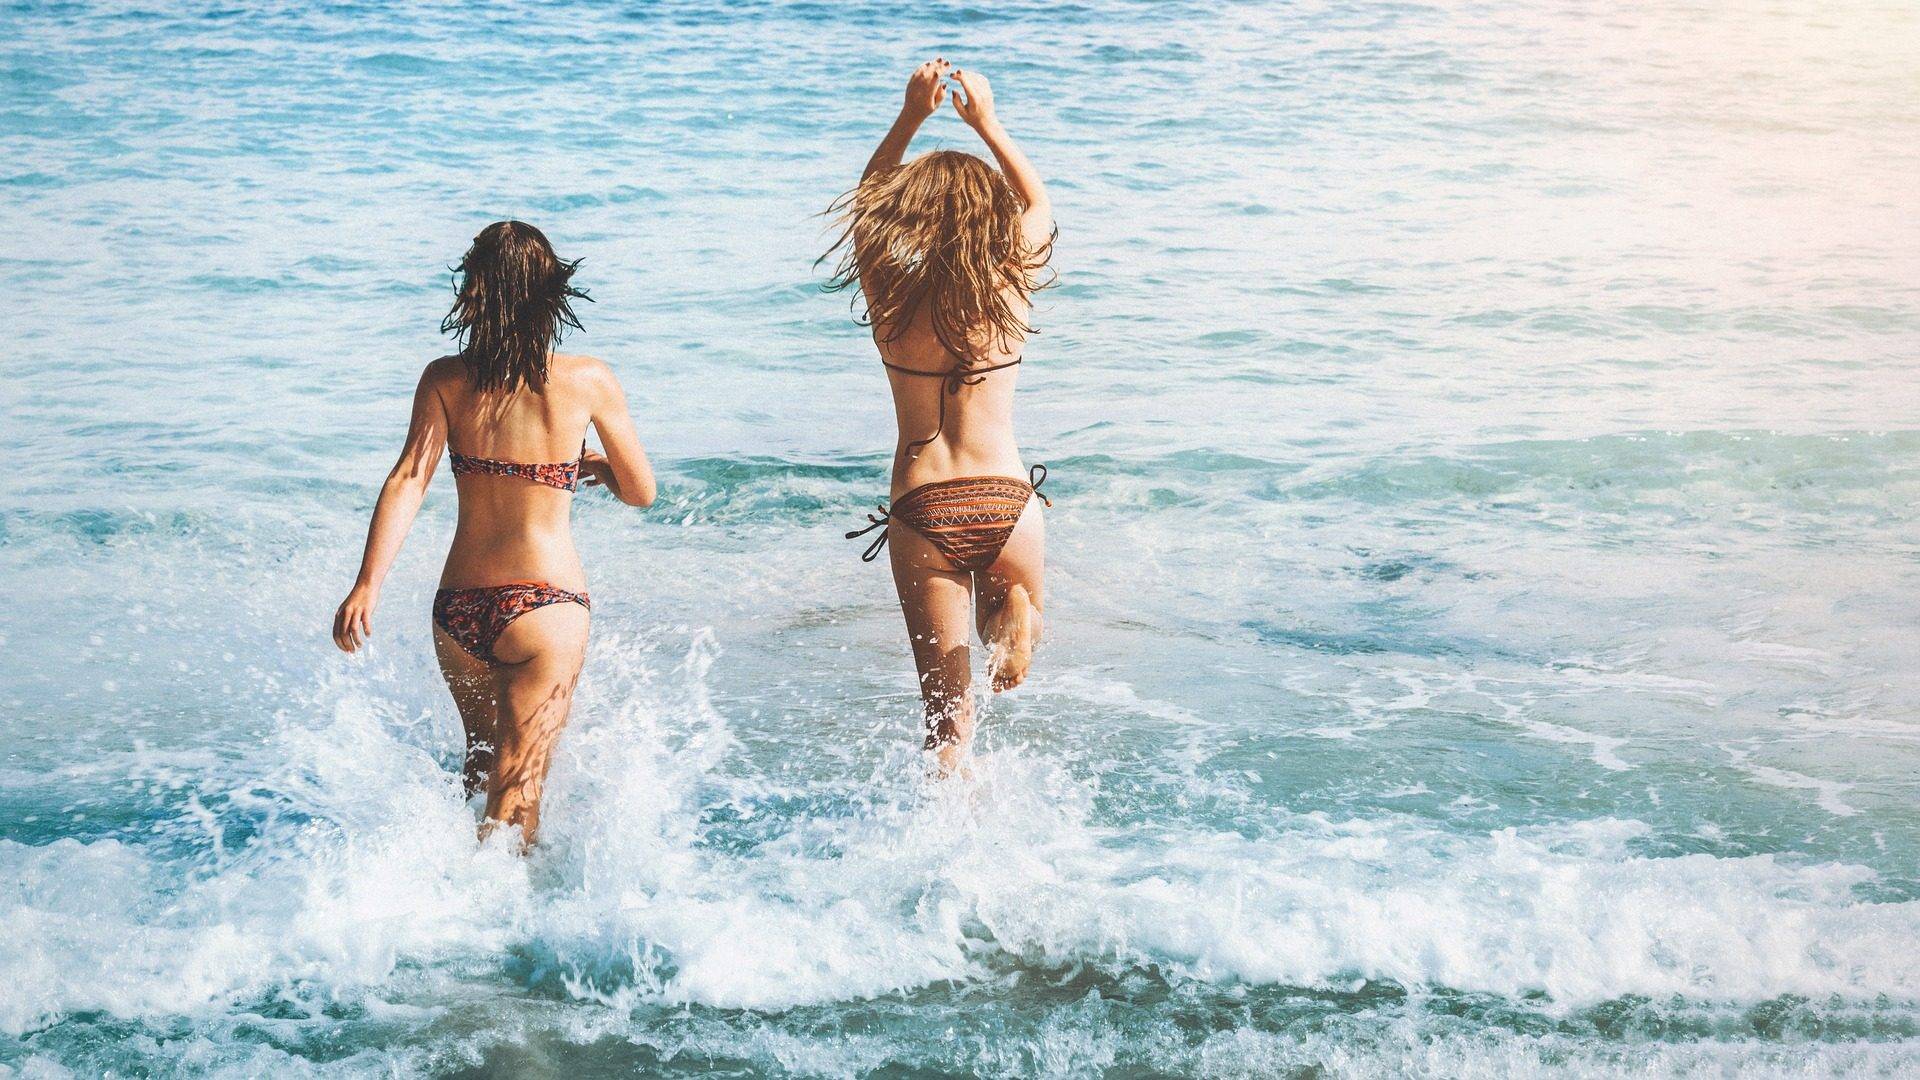 Plage, été, Mer, vacances, jeunes filles, femmes, Bikini - Fonds d'écran HD - Professor-falken.com